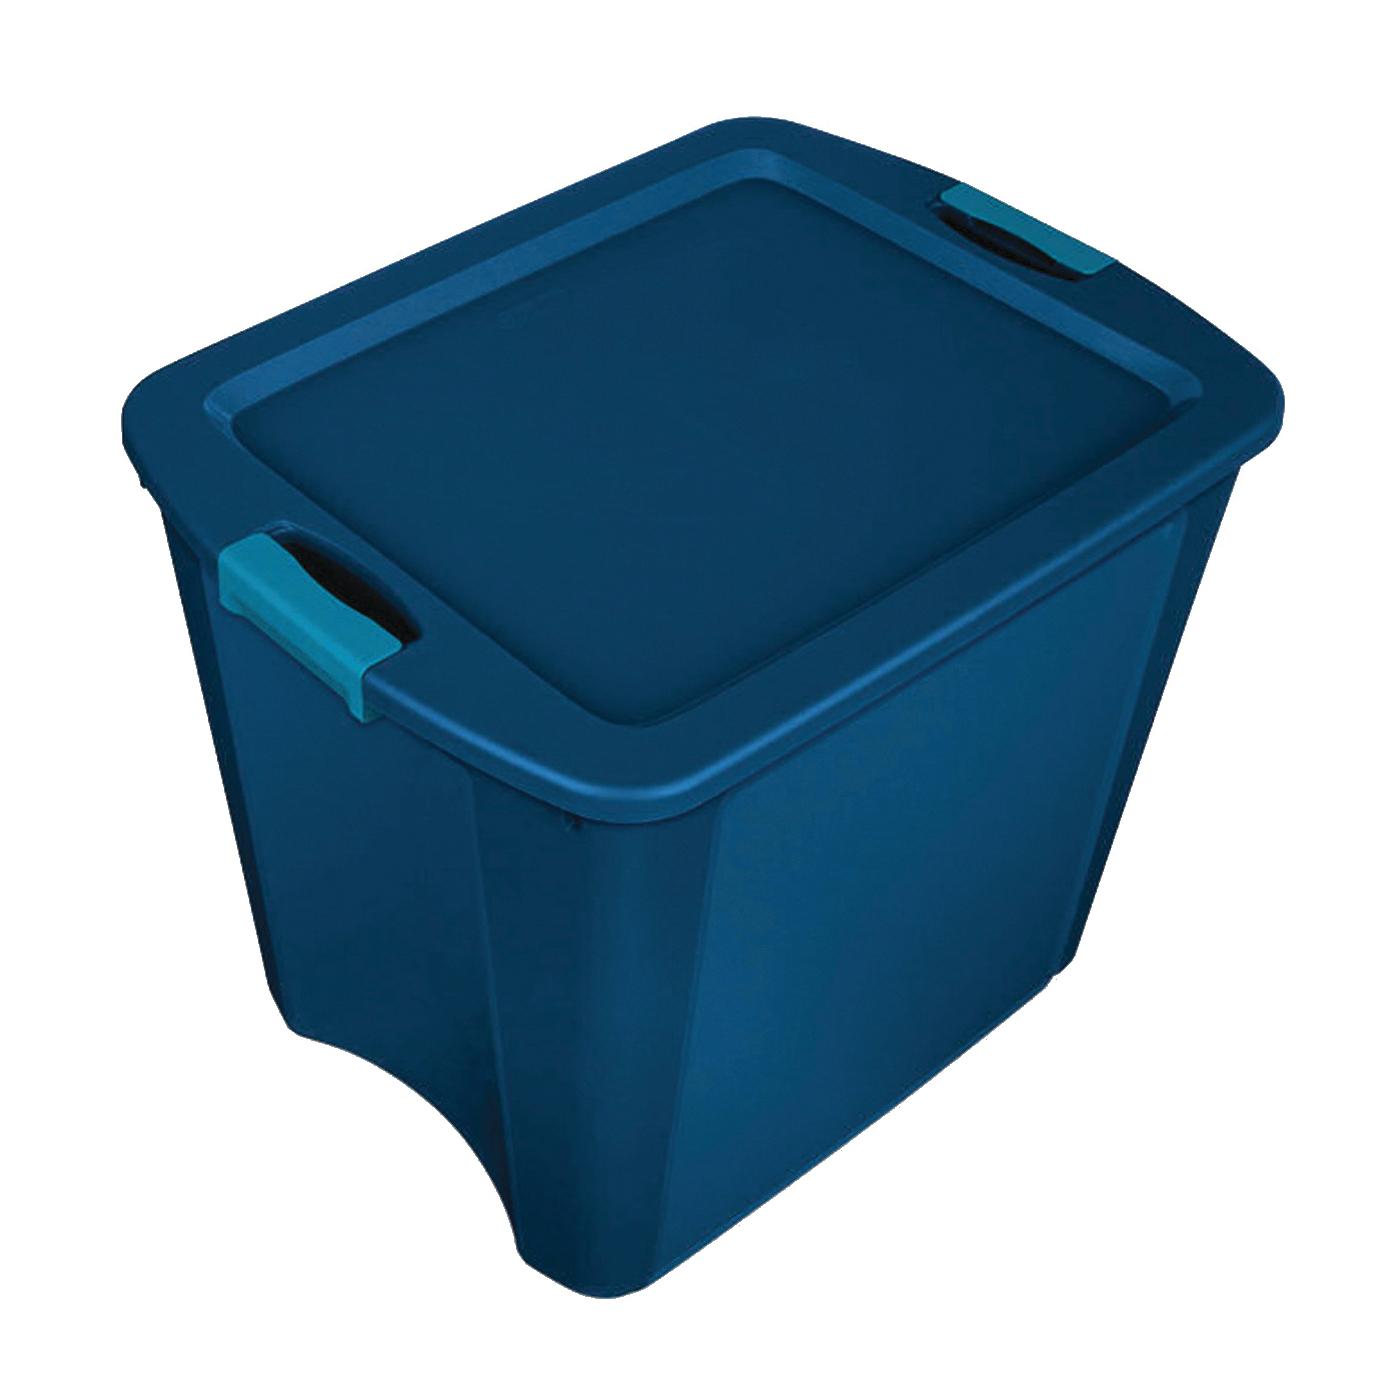 Picture of Sterilite 14487404 Carry Tote, Plastic, True Blue, 23-5/8 in L, 18-5/8 in W, 20-1/8 in H